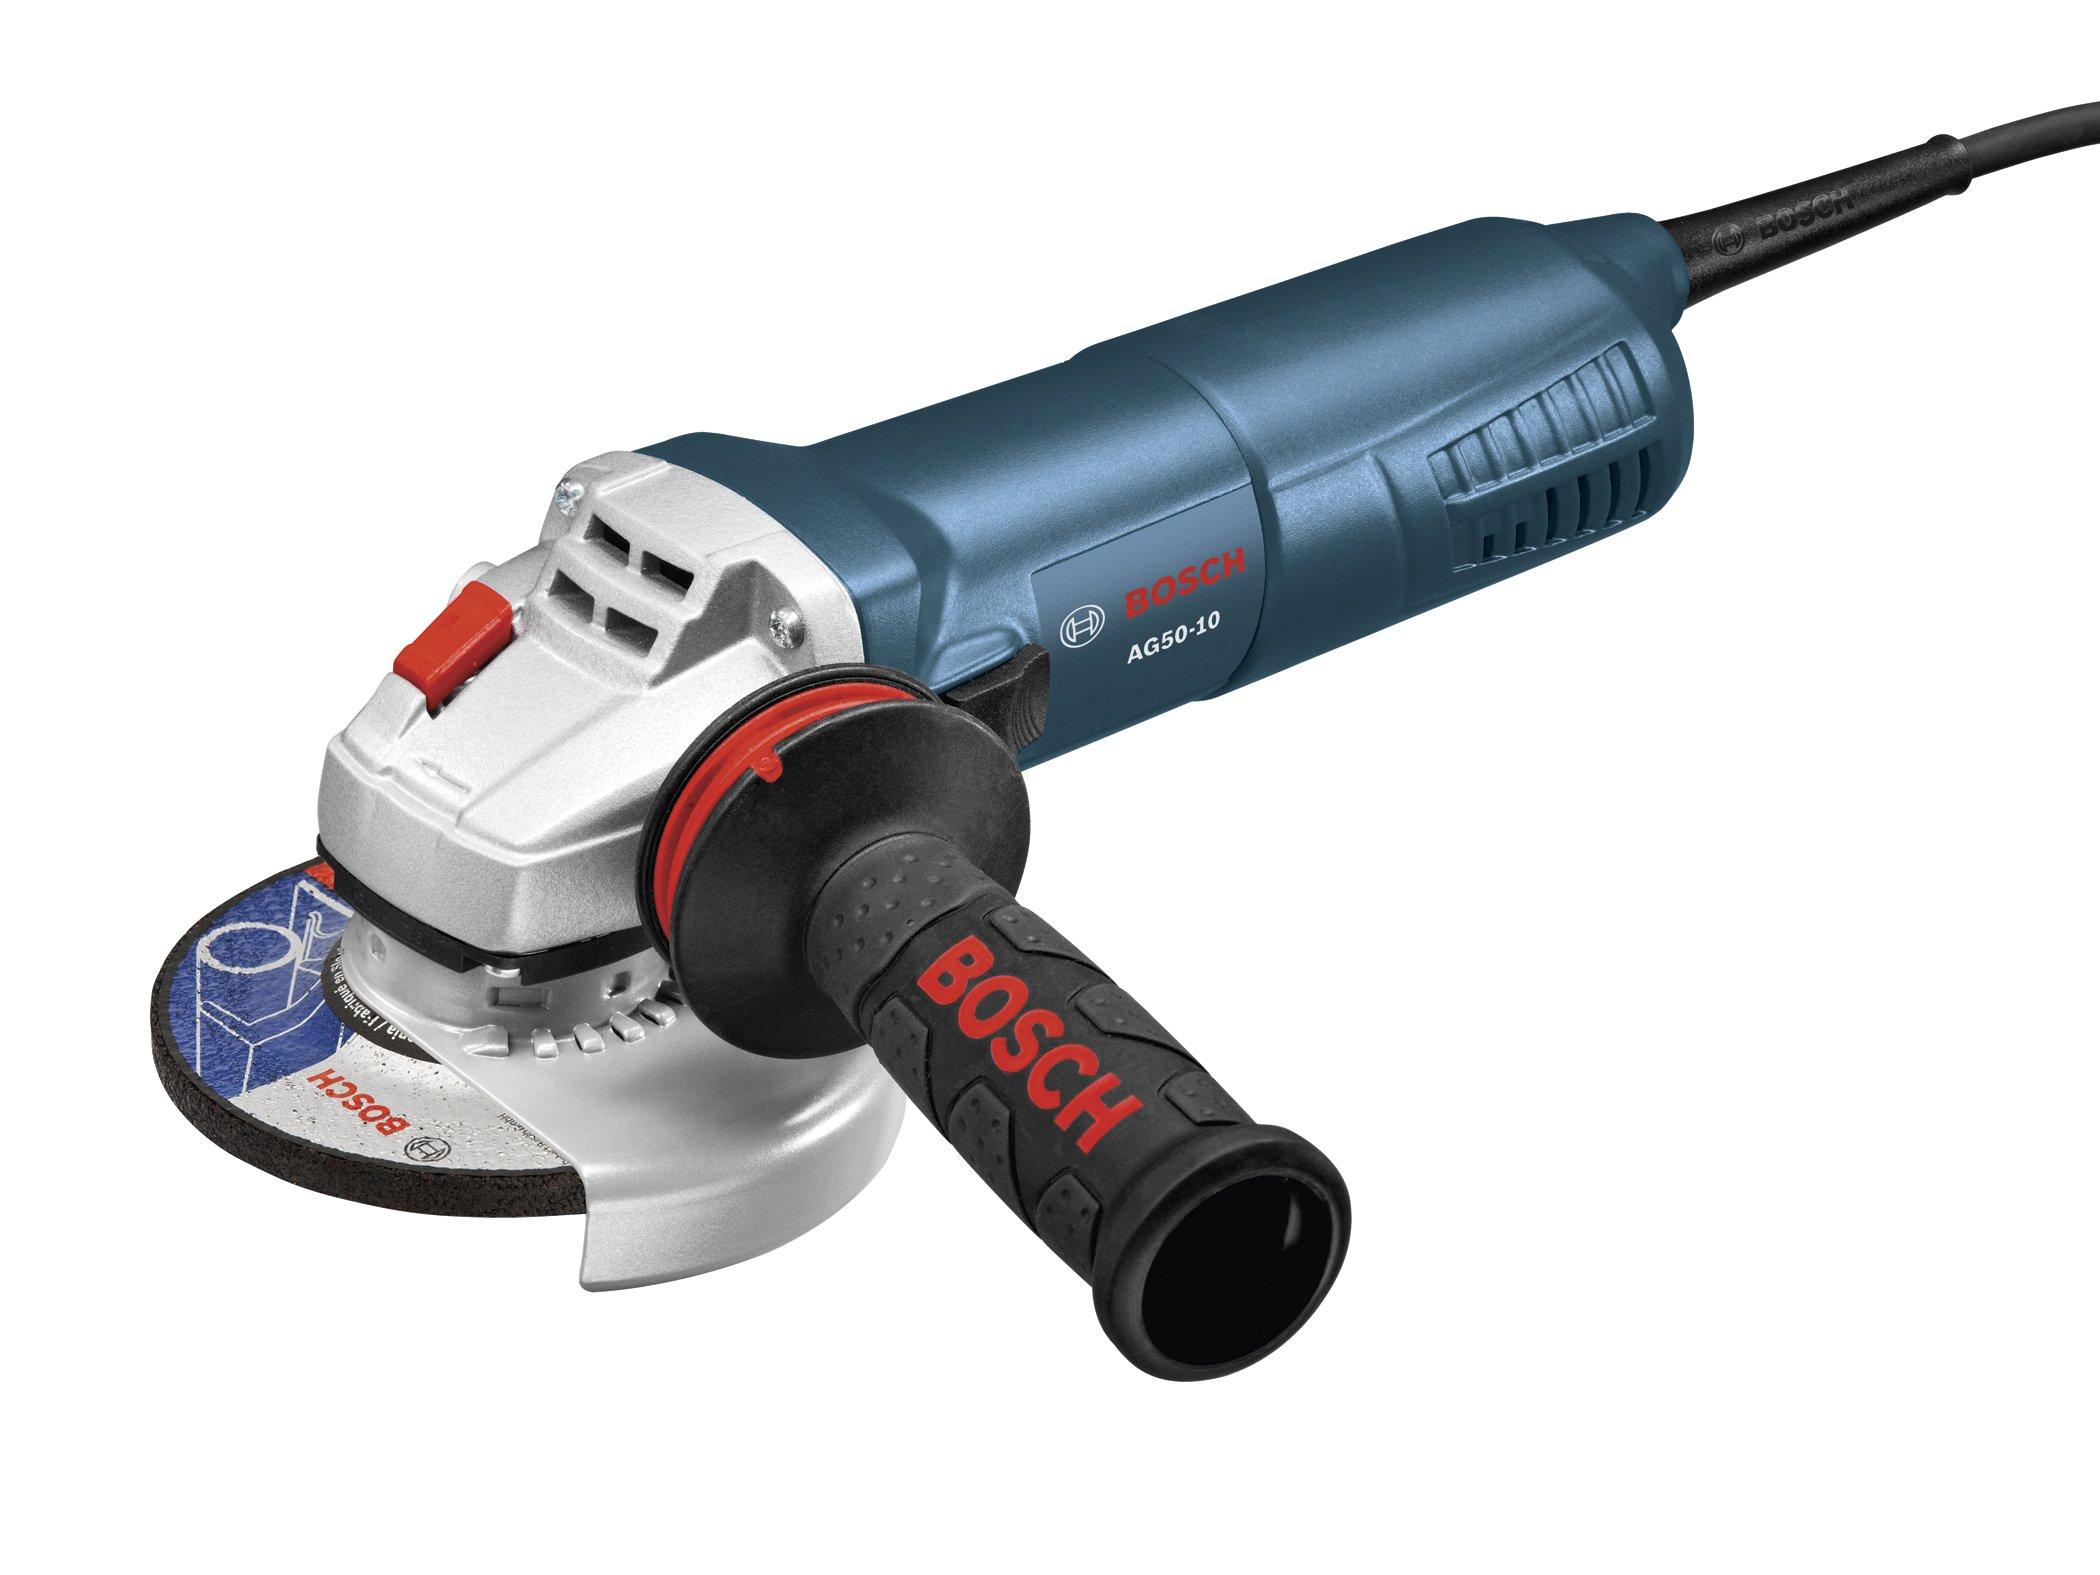 Bosch AG50-10 5-Inch Angle Grinder, 10-Amp